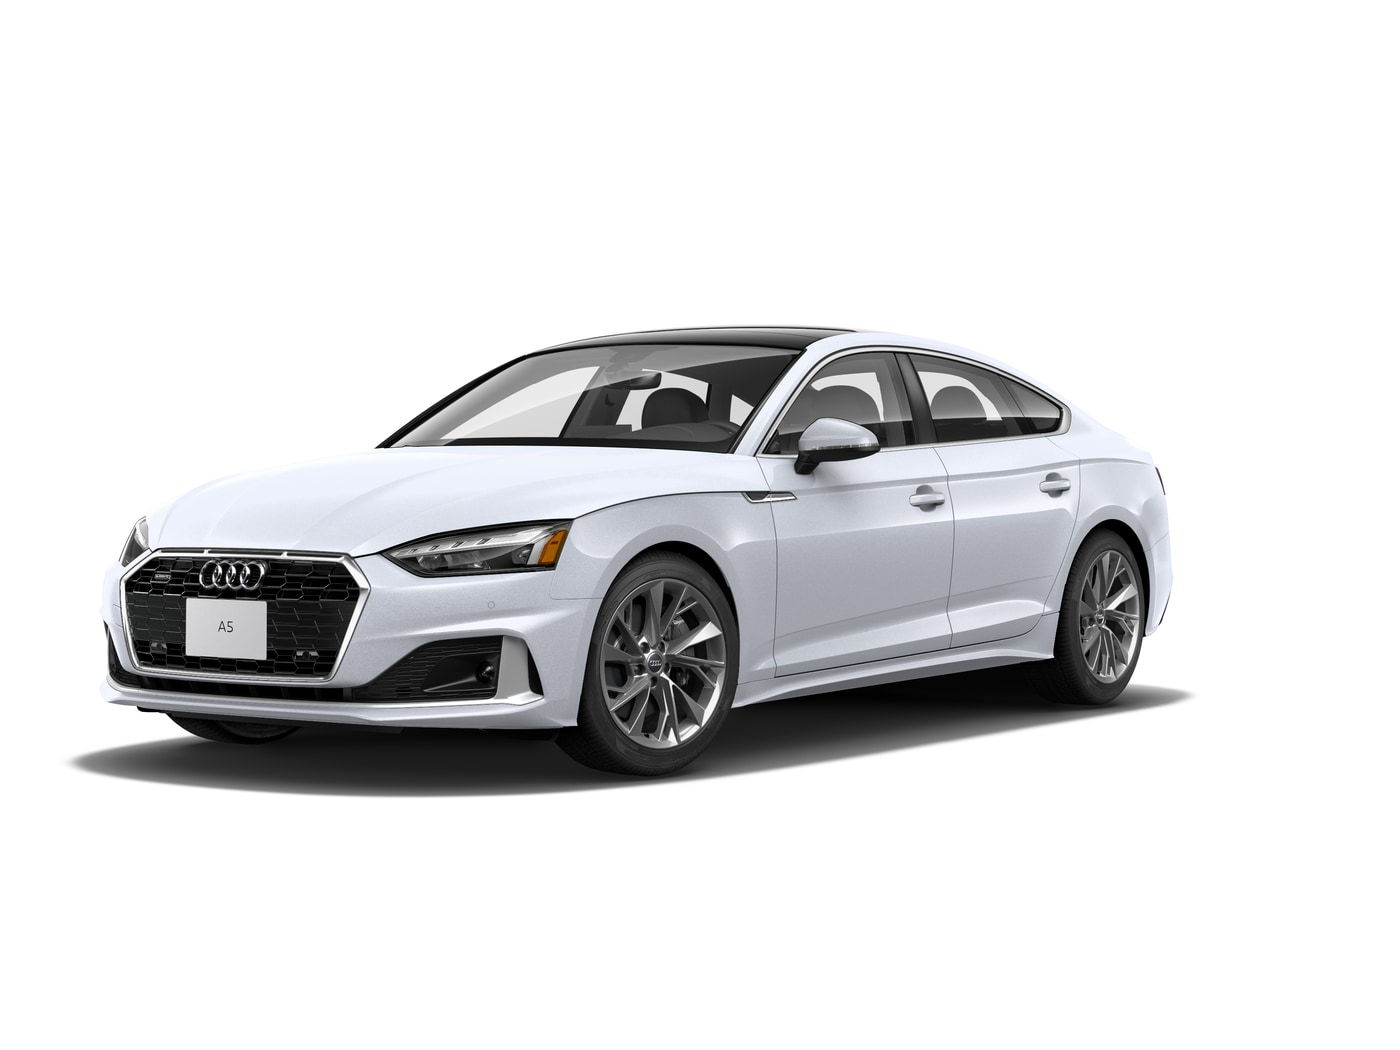 New 2020 Audi A5 2.0T Premium Plus Sportback in New London